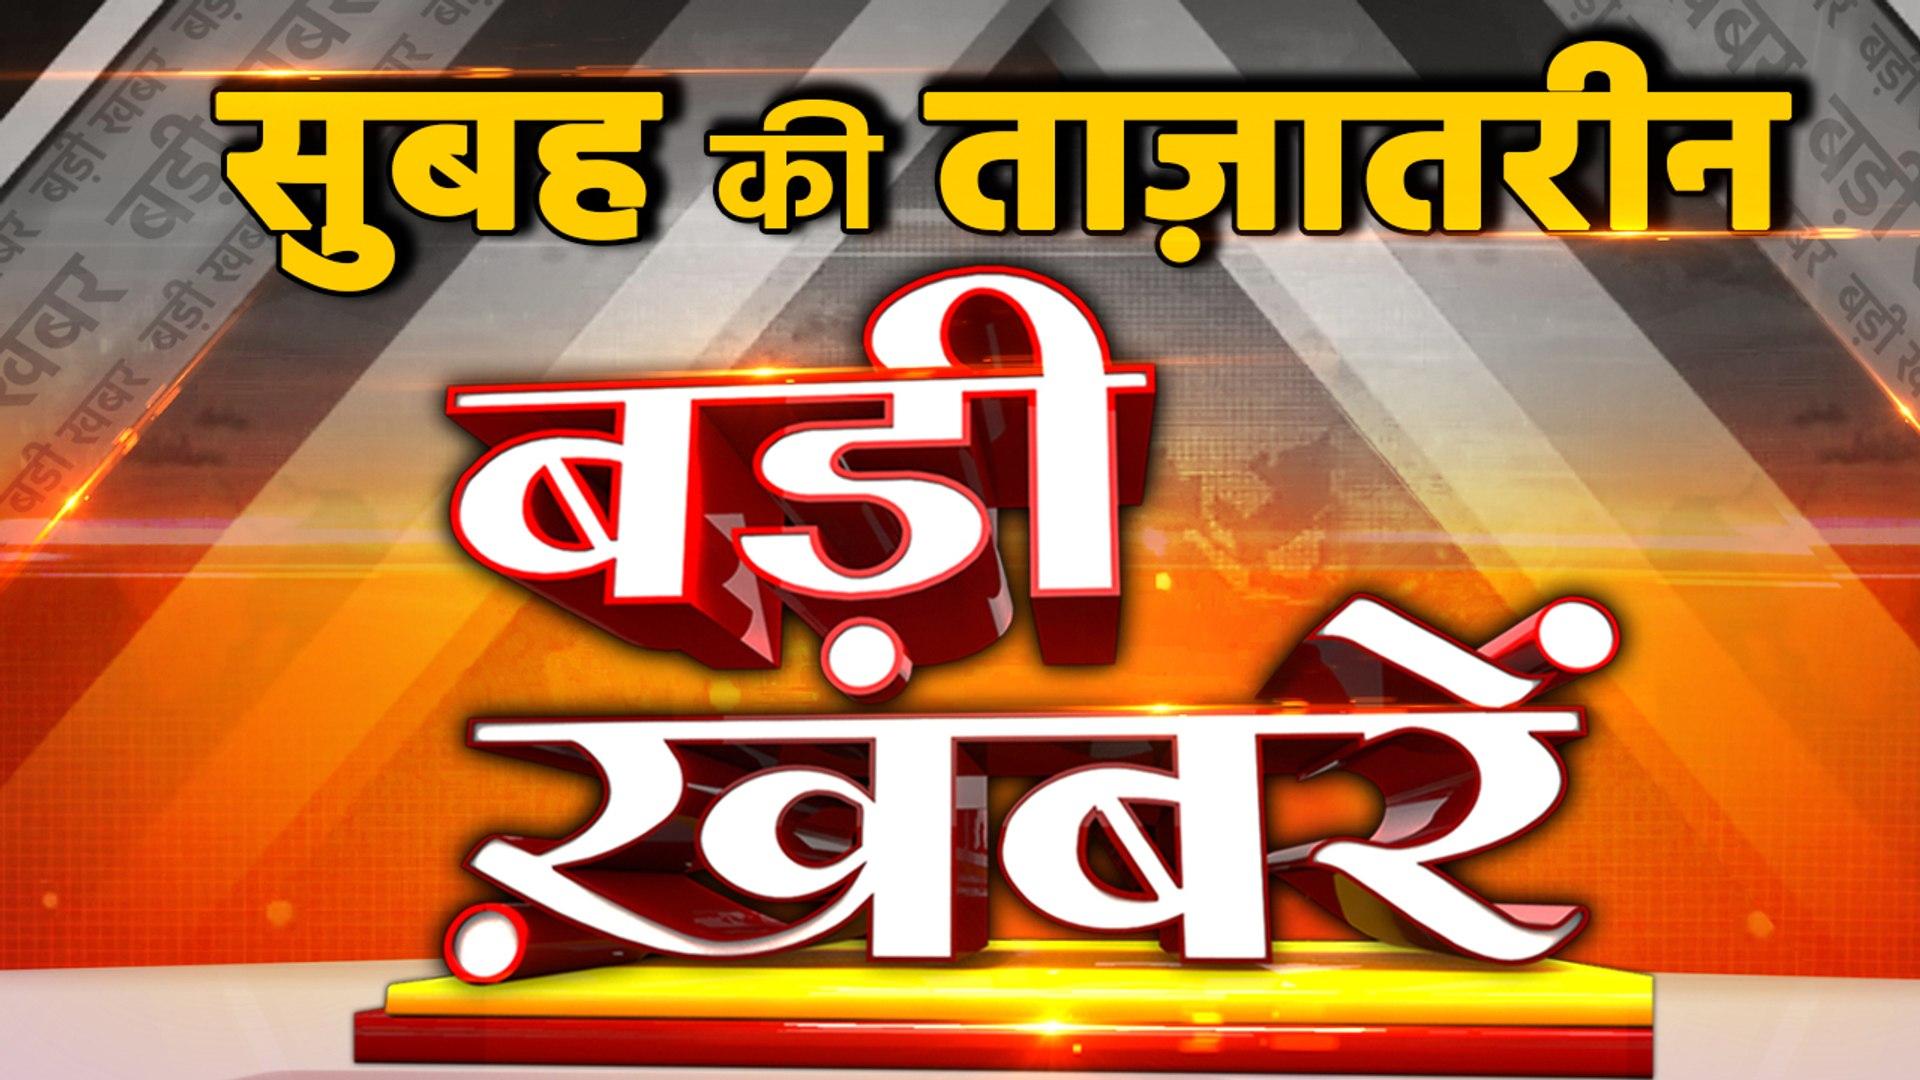 Top News | Latest News | Top Headlines | 02 December  News | India Top News | वनइंडिया हिंदी